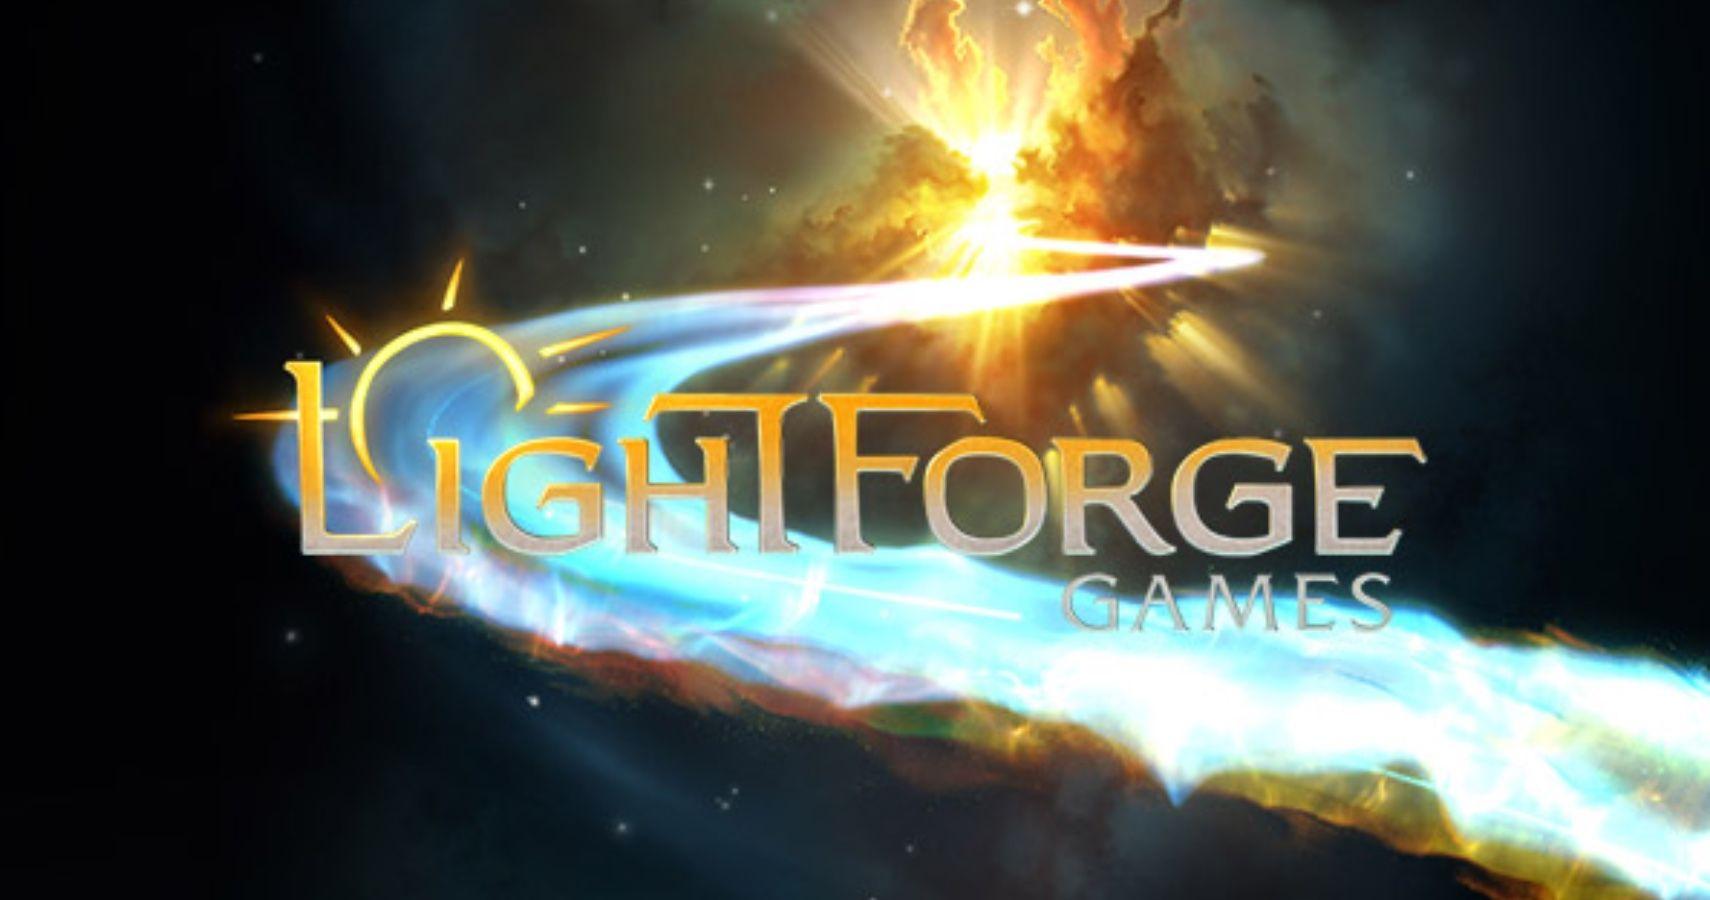 New Studio, Lightforge Games, Established By Former Epic And Blizzard Developers